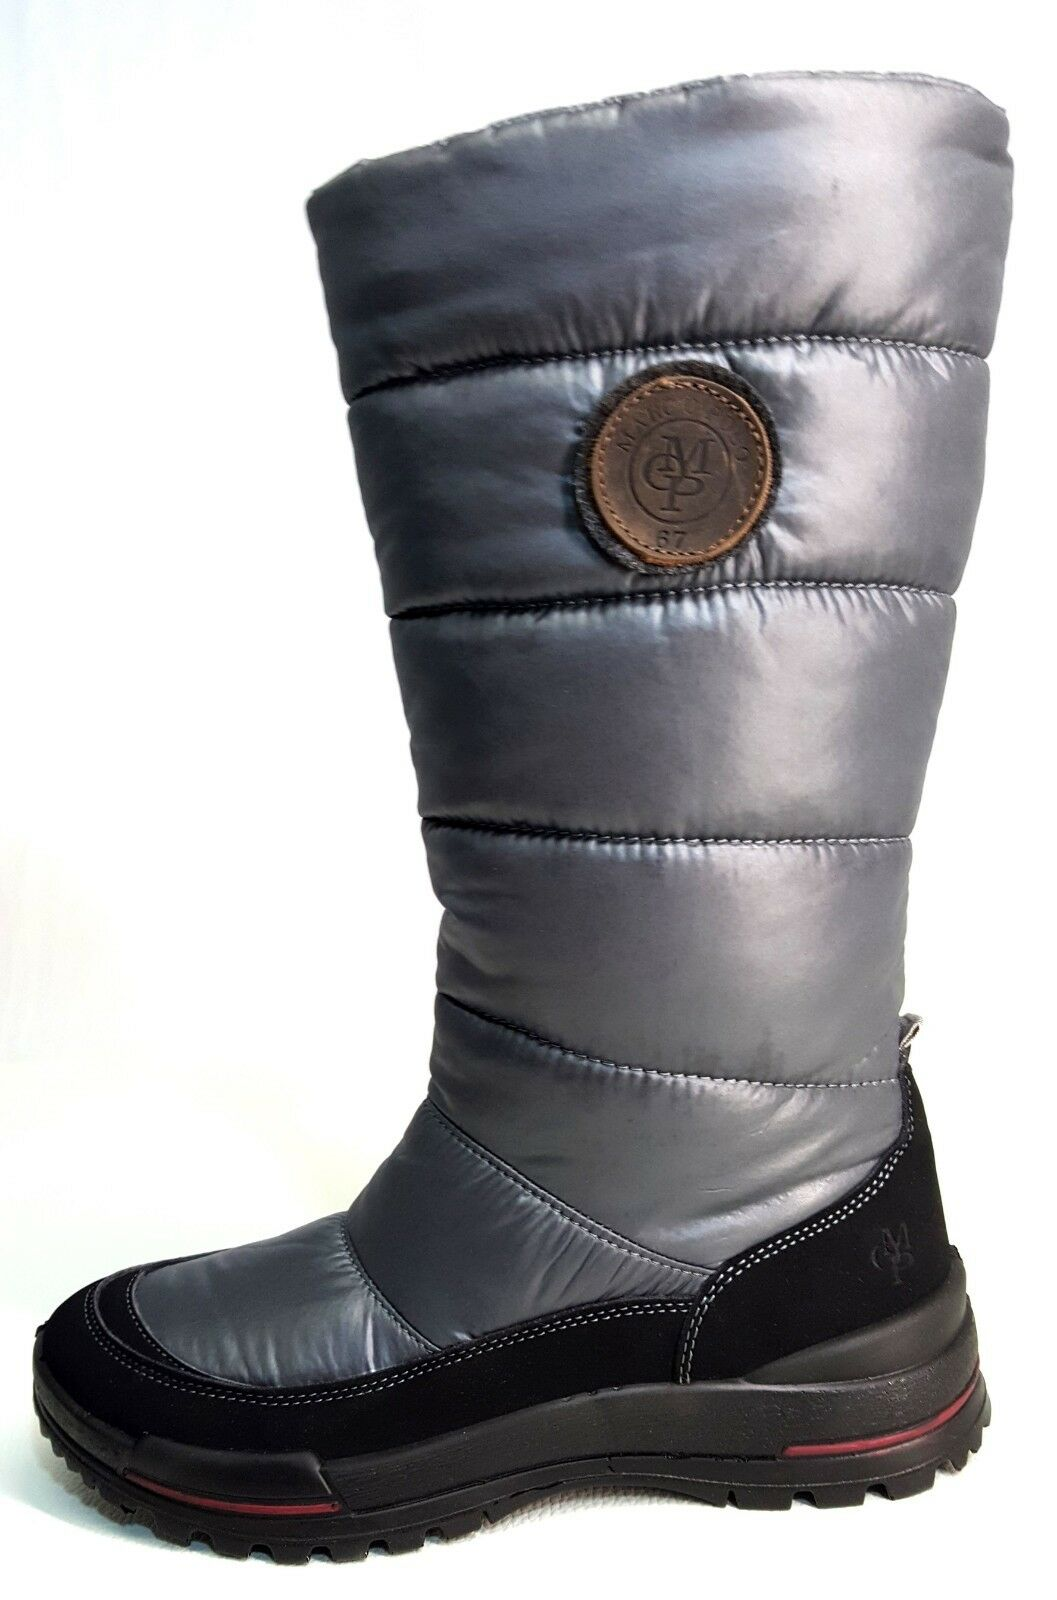 Marc O Polo Damen Stiefel Winterstiefel Stiefel grau gefüttert leicht  NEU